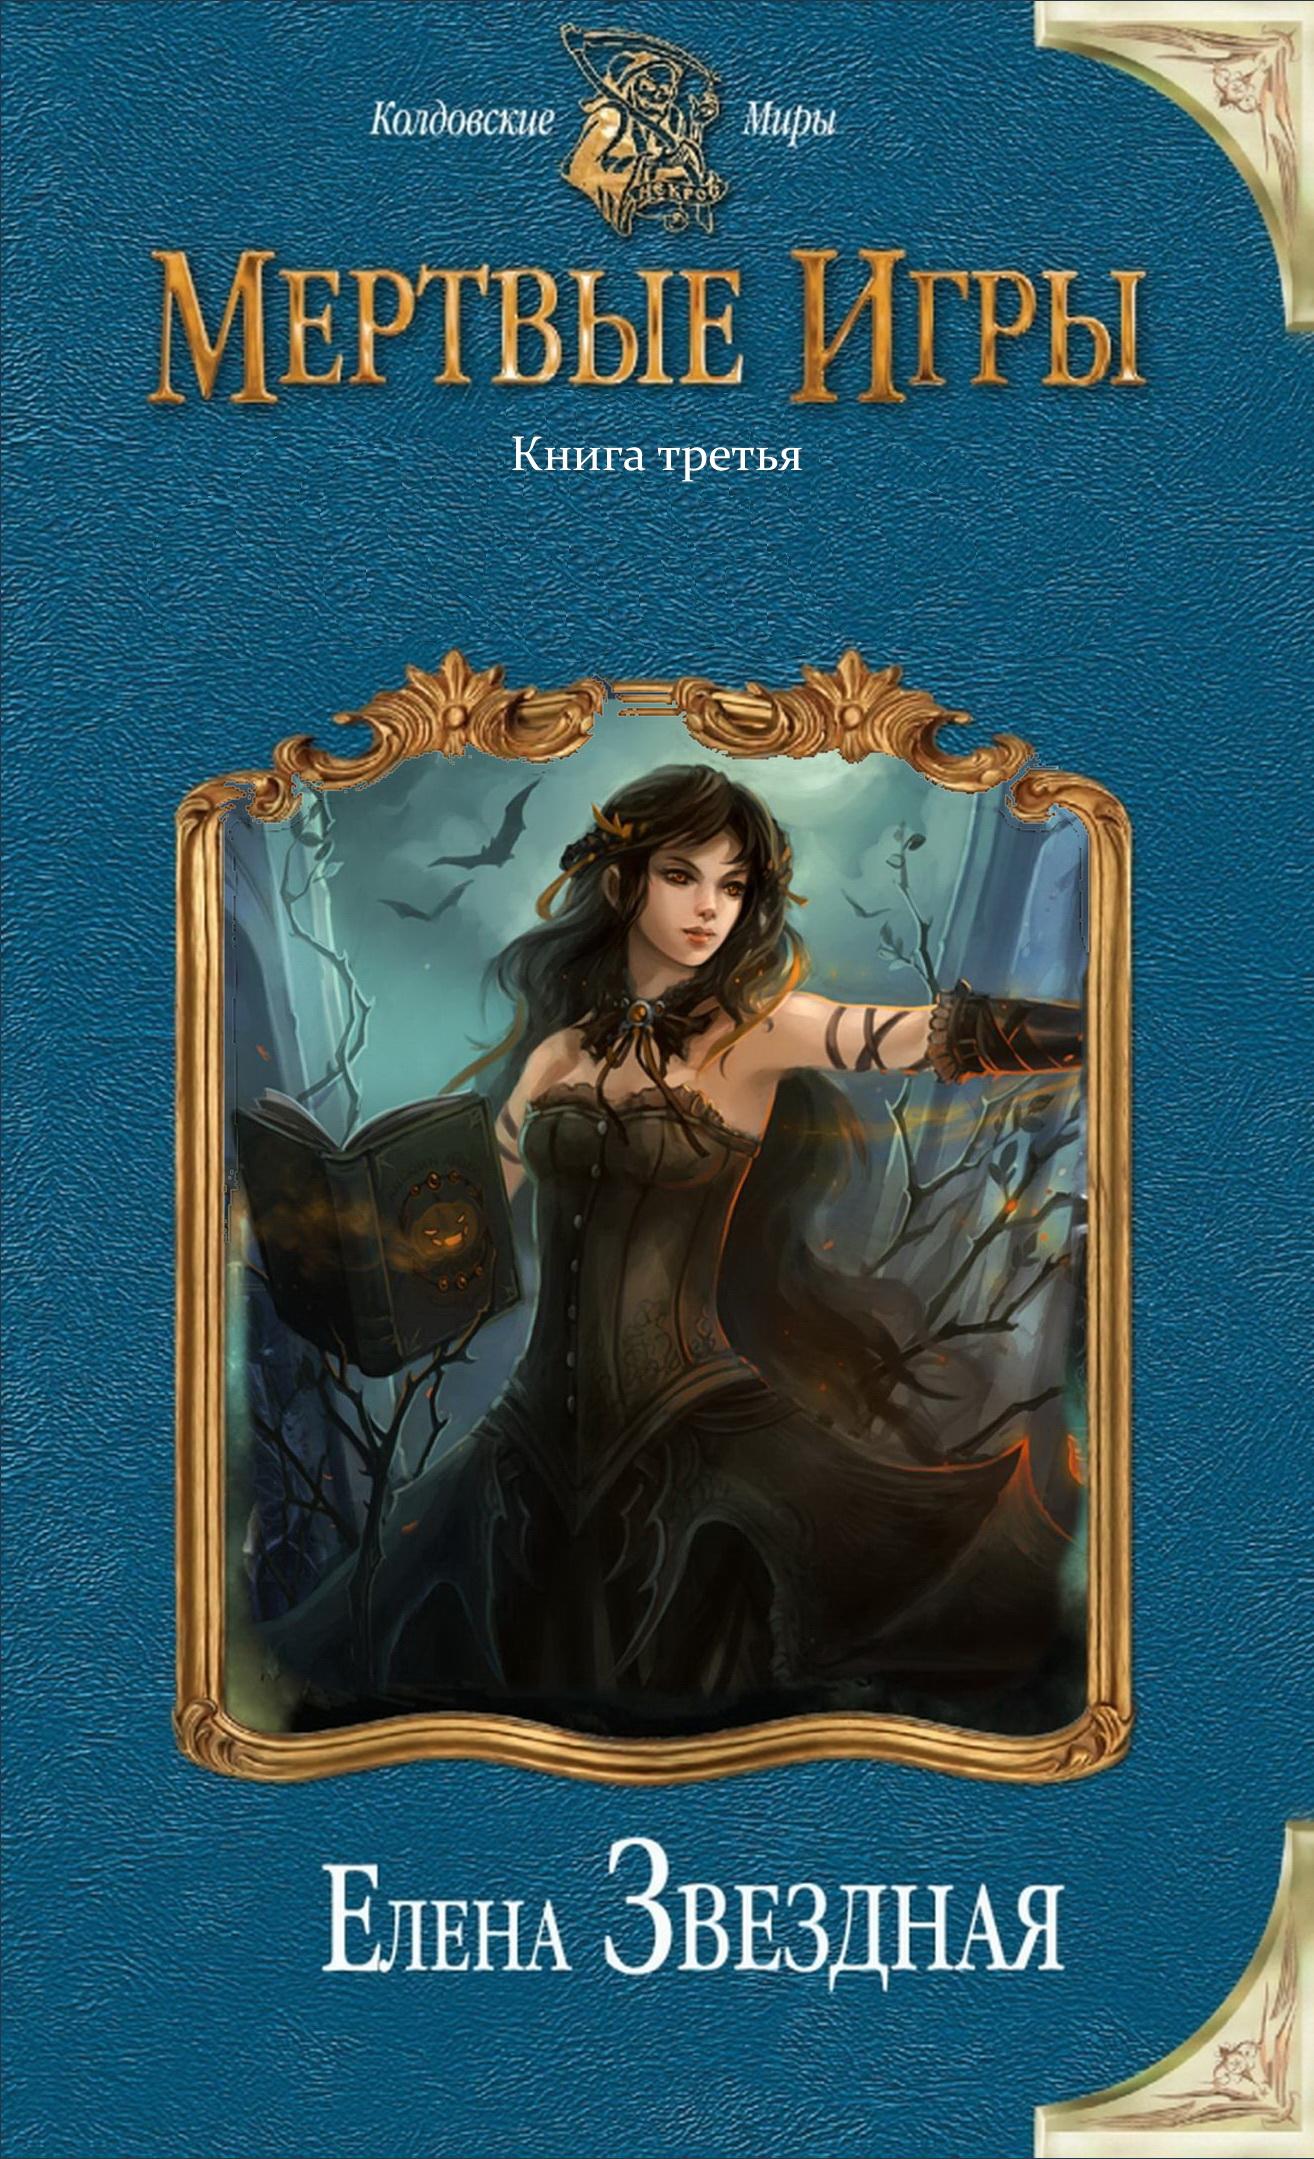 Книга звездная елена темная империя 2